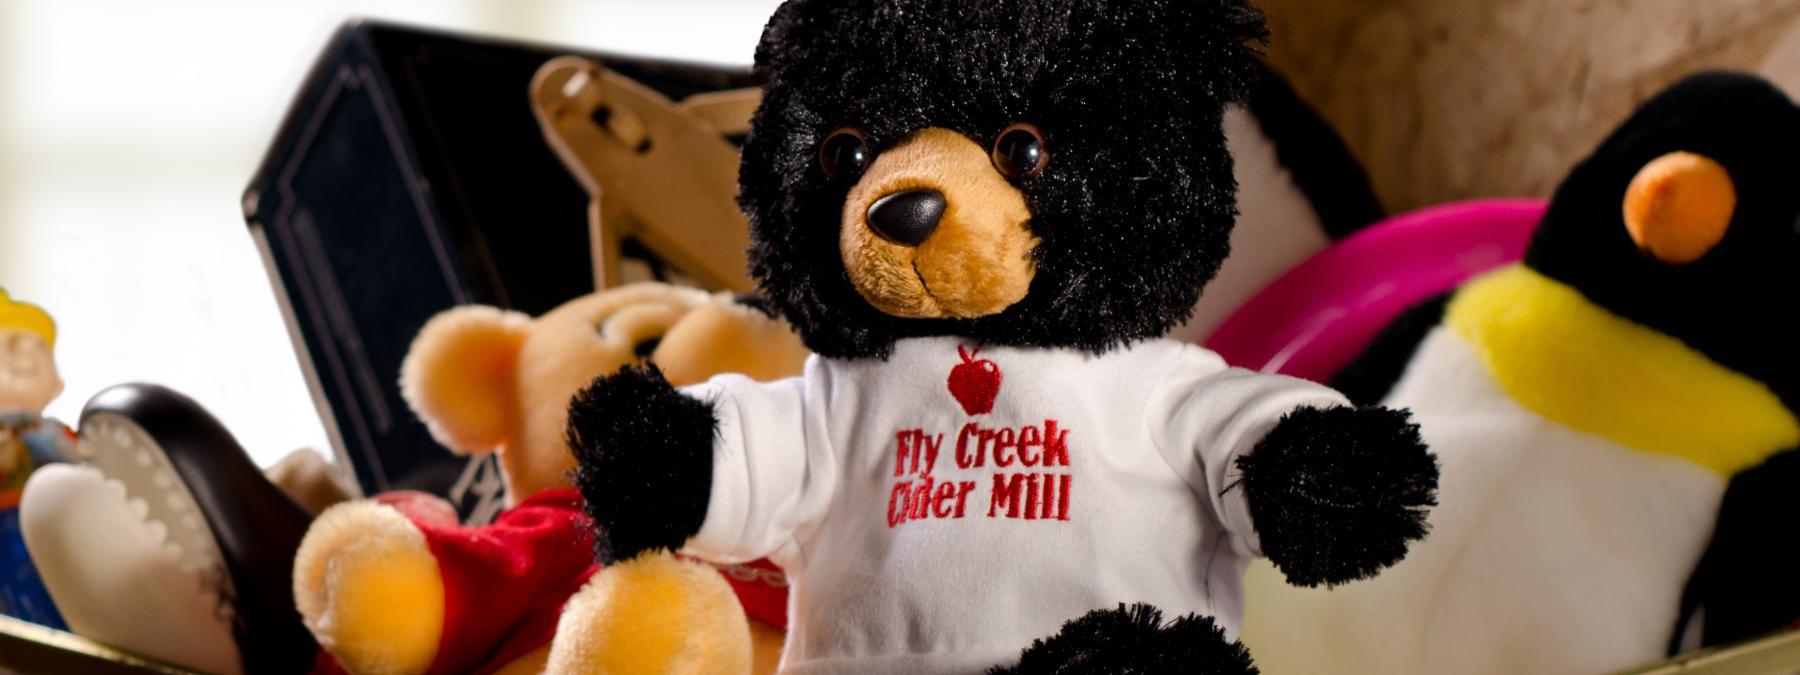 Fly Creek Merchandise